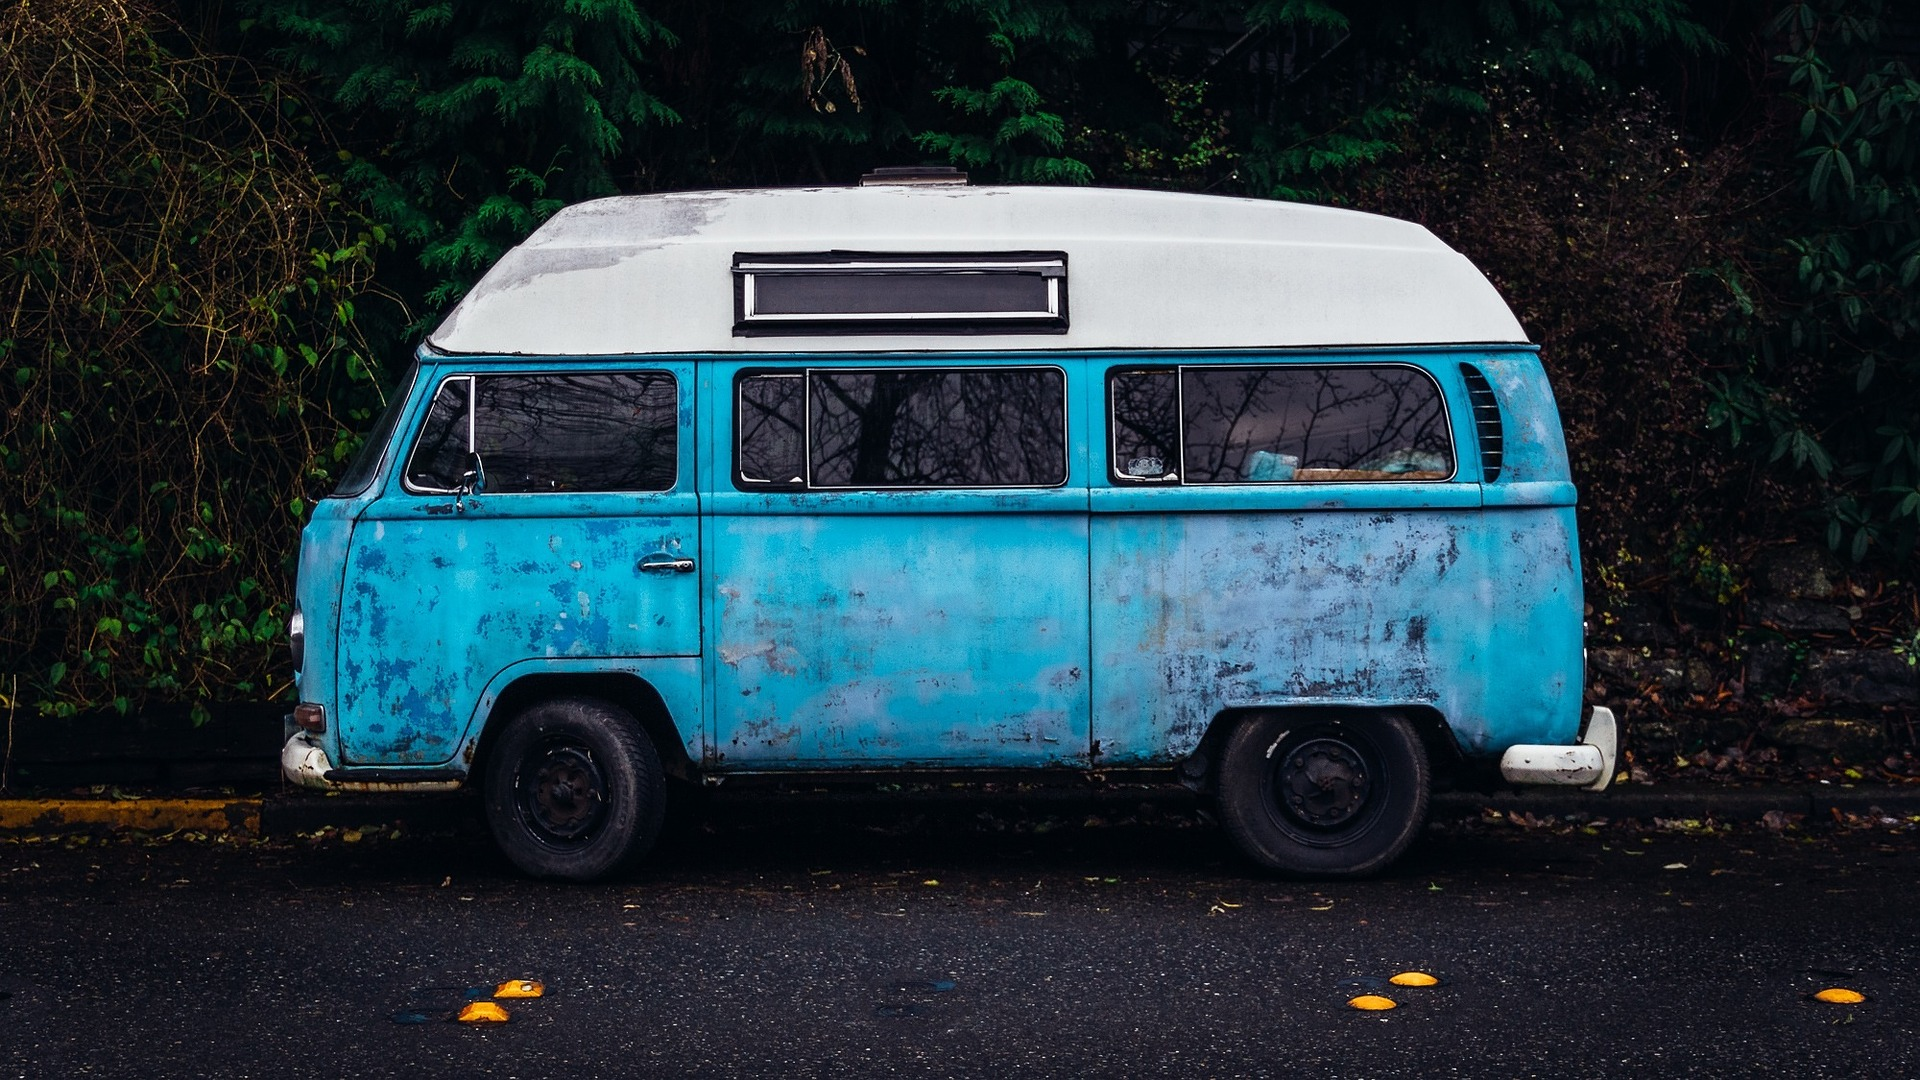 Imagem mostra uma van azul na estrada.